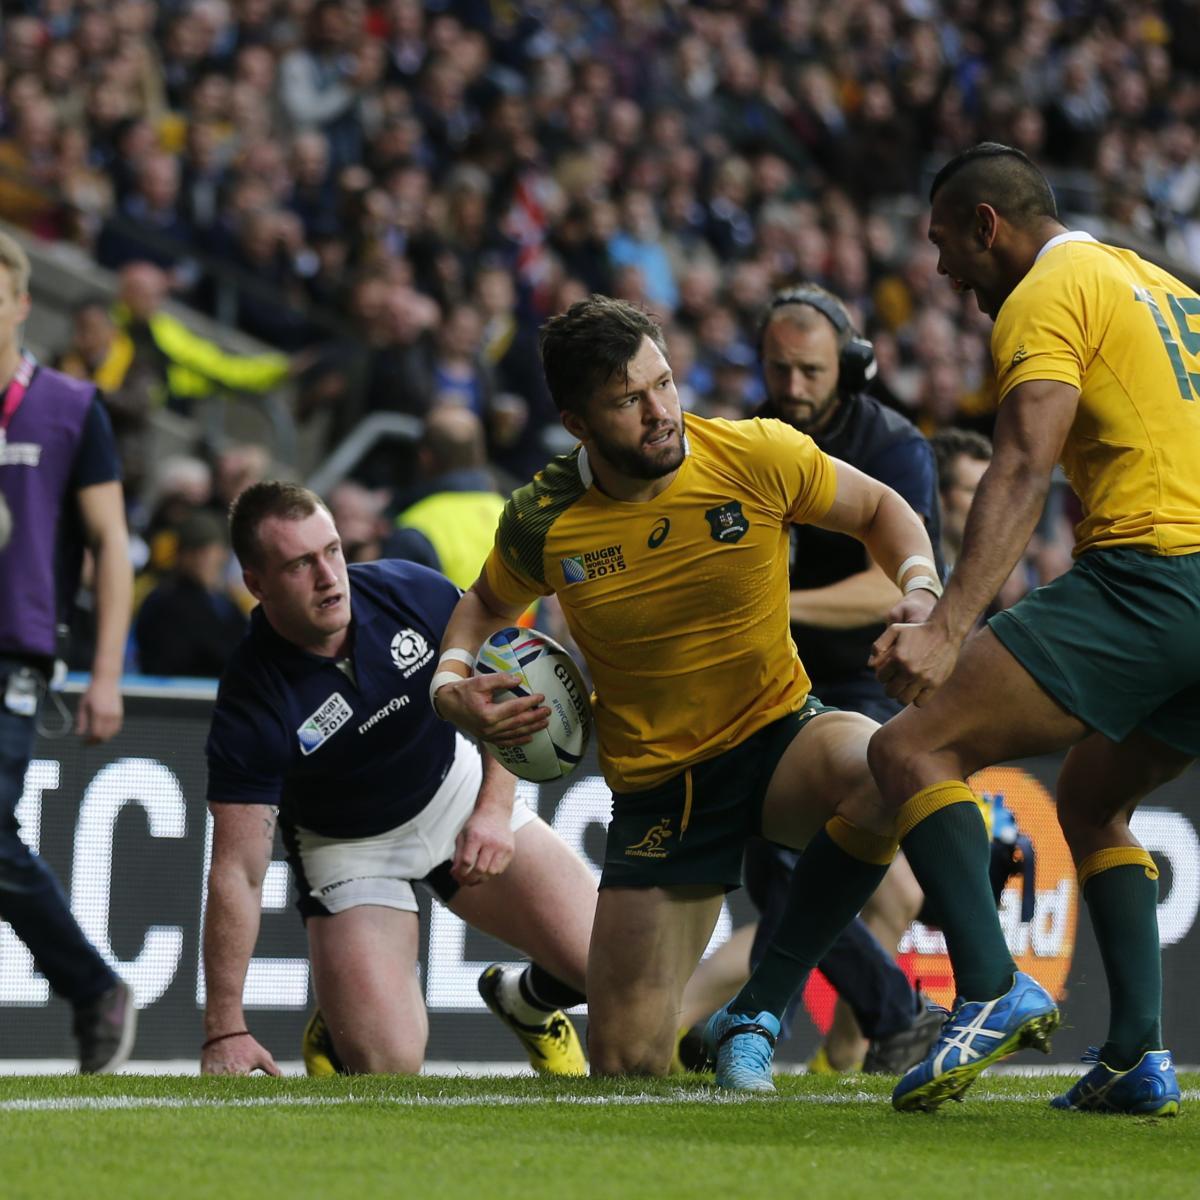 Scotland V Australia World Rugby: Australia Vs. Scotland: Score, Reaction From Rugby World